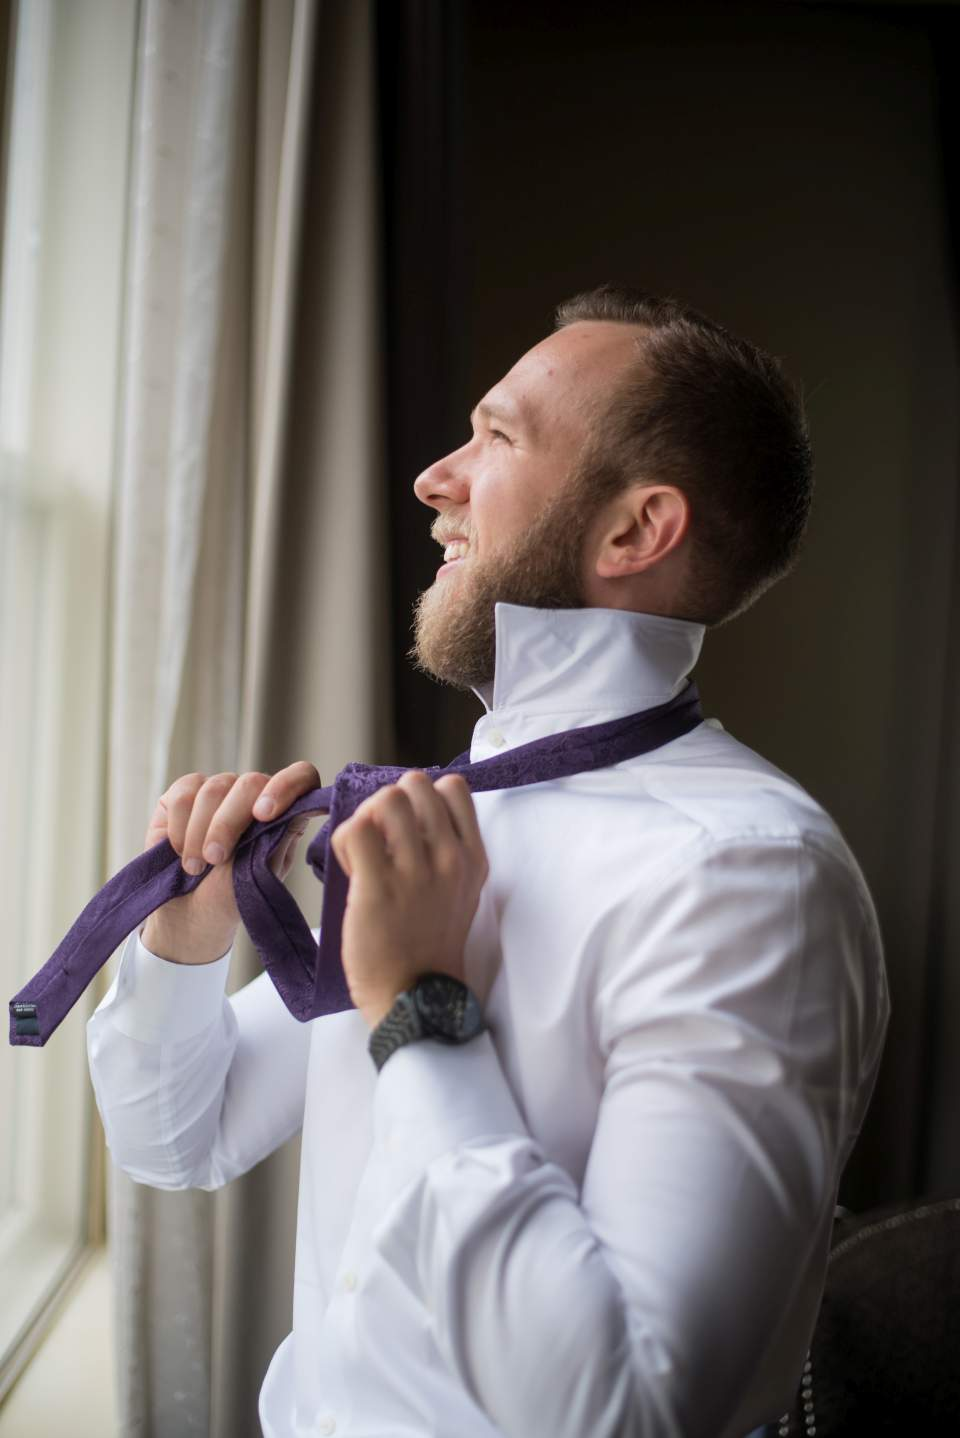 candid wedding photos of groom putting tie on